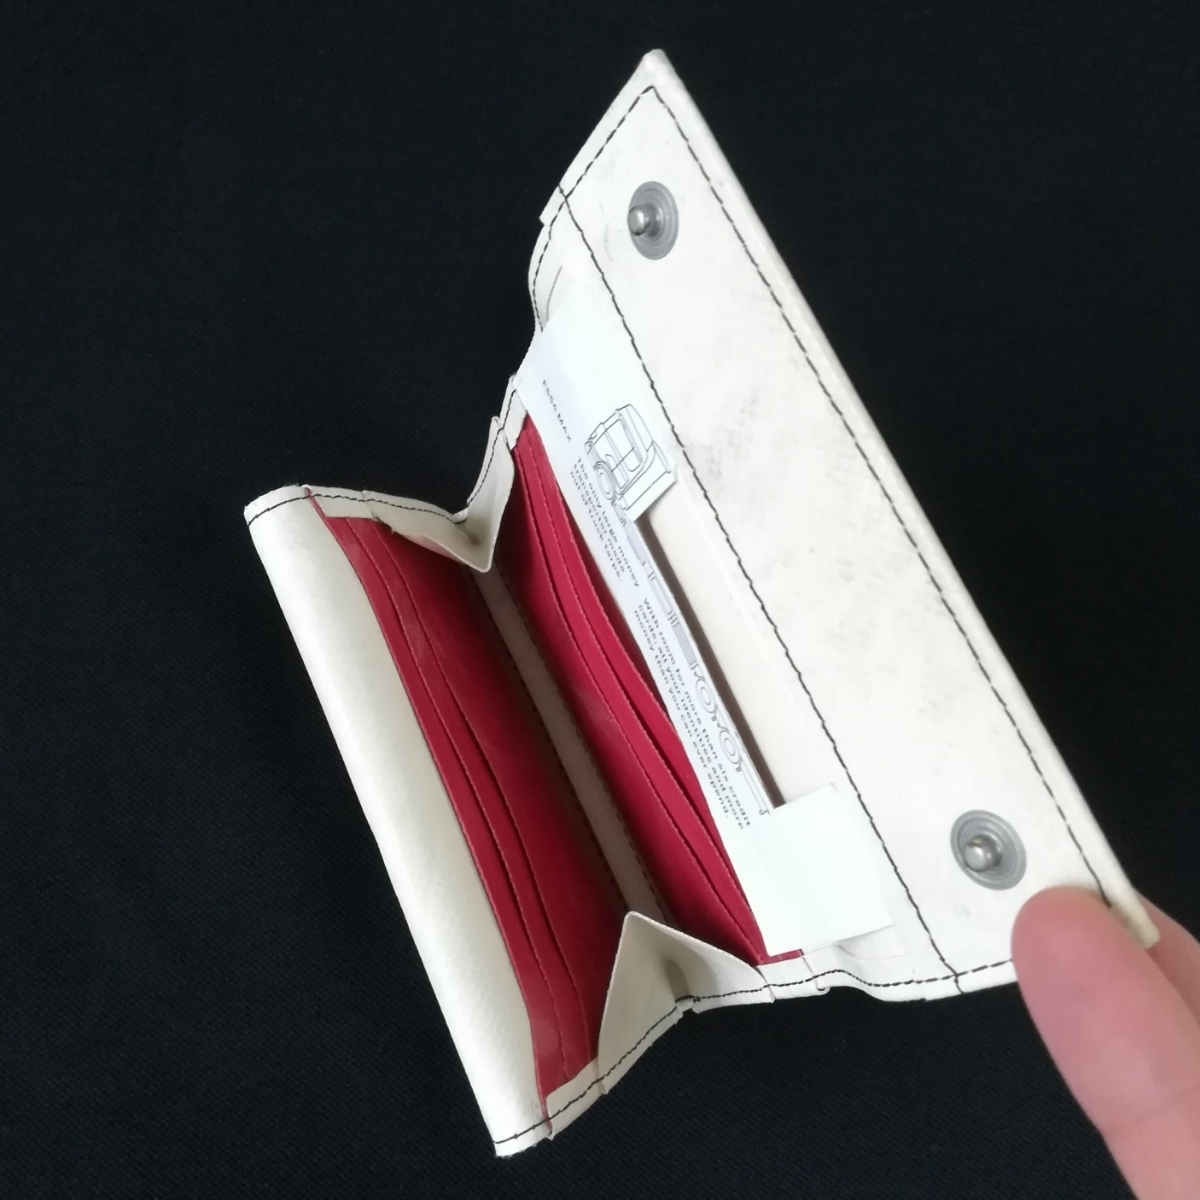 17b33d102350 代購代標第一品牌- 樂淘letao - 新品フライターグF554 MAX クリーム×レッド財布FREITAG ミディアムサイズ財布WALLET M